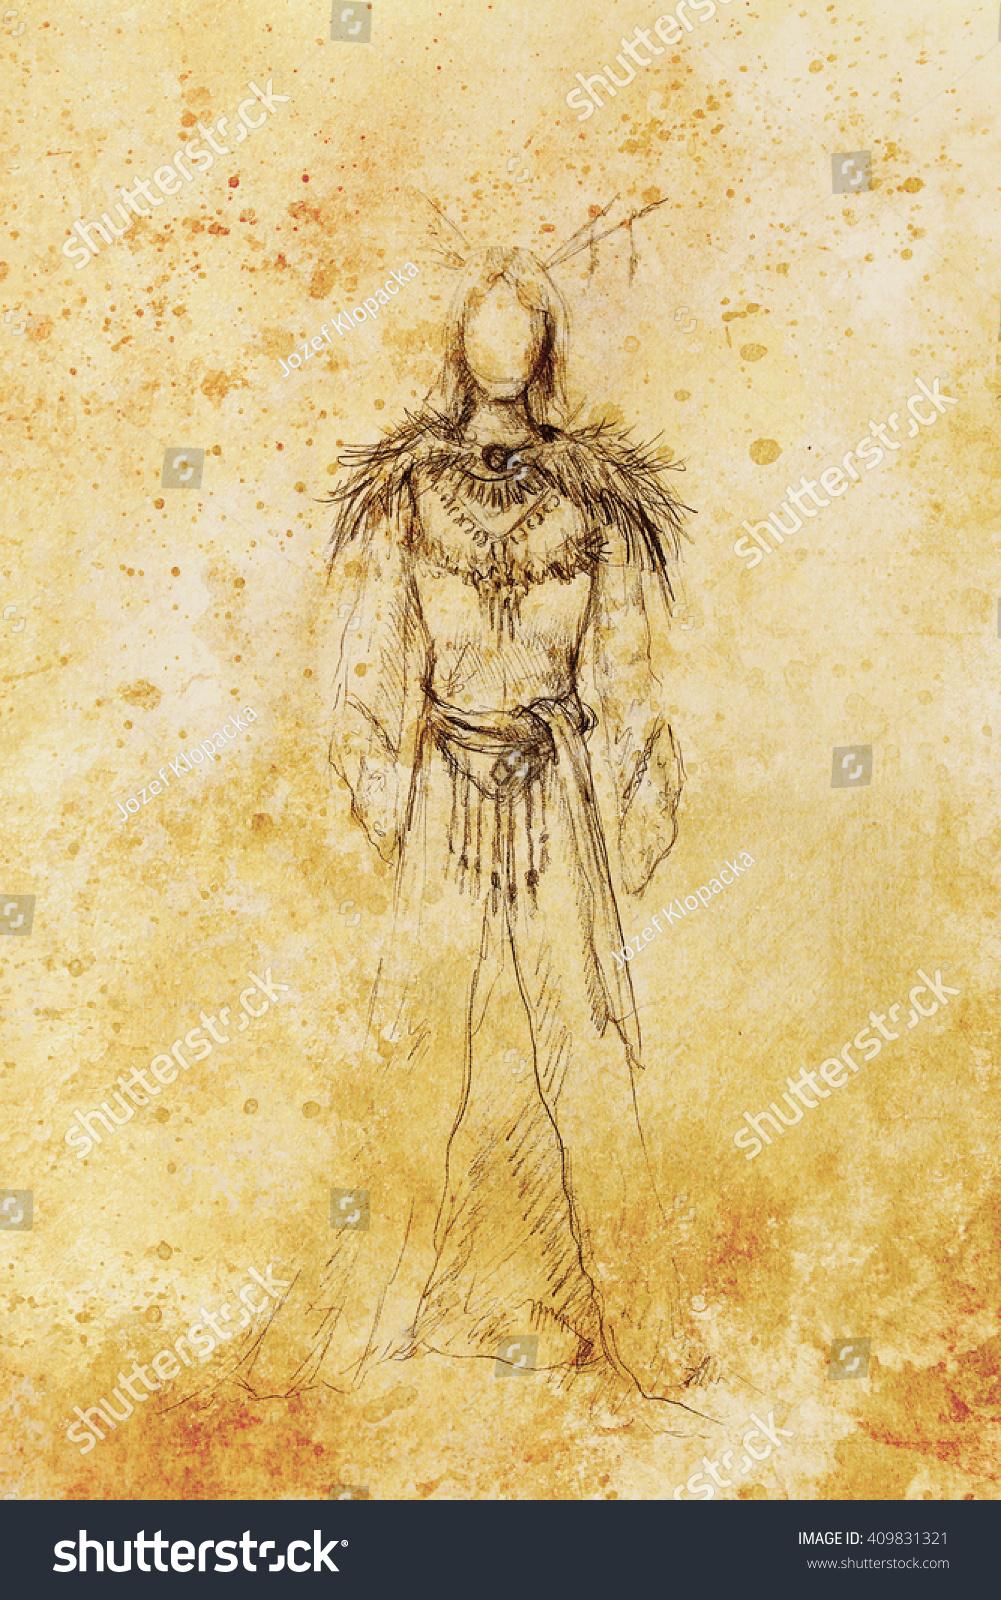 Drawing Mystical Indian Woman Beautiful Dress Stock Illustration 409831321